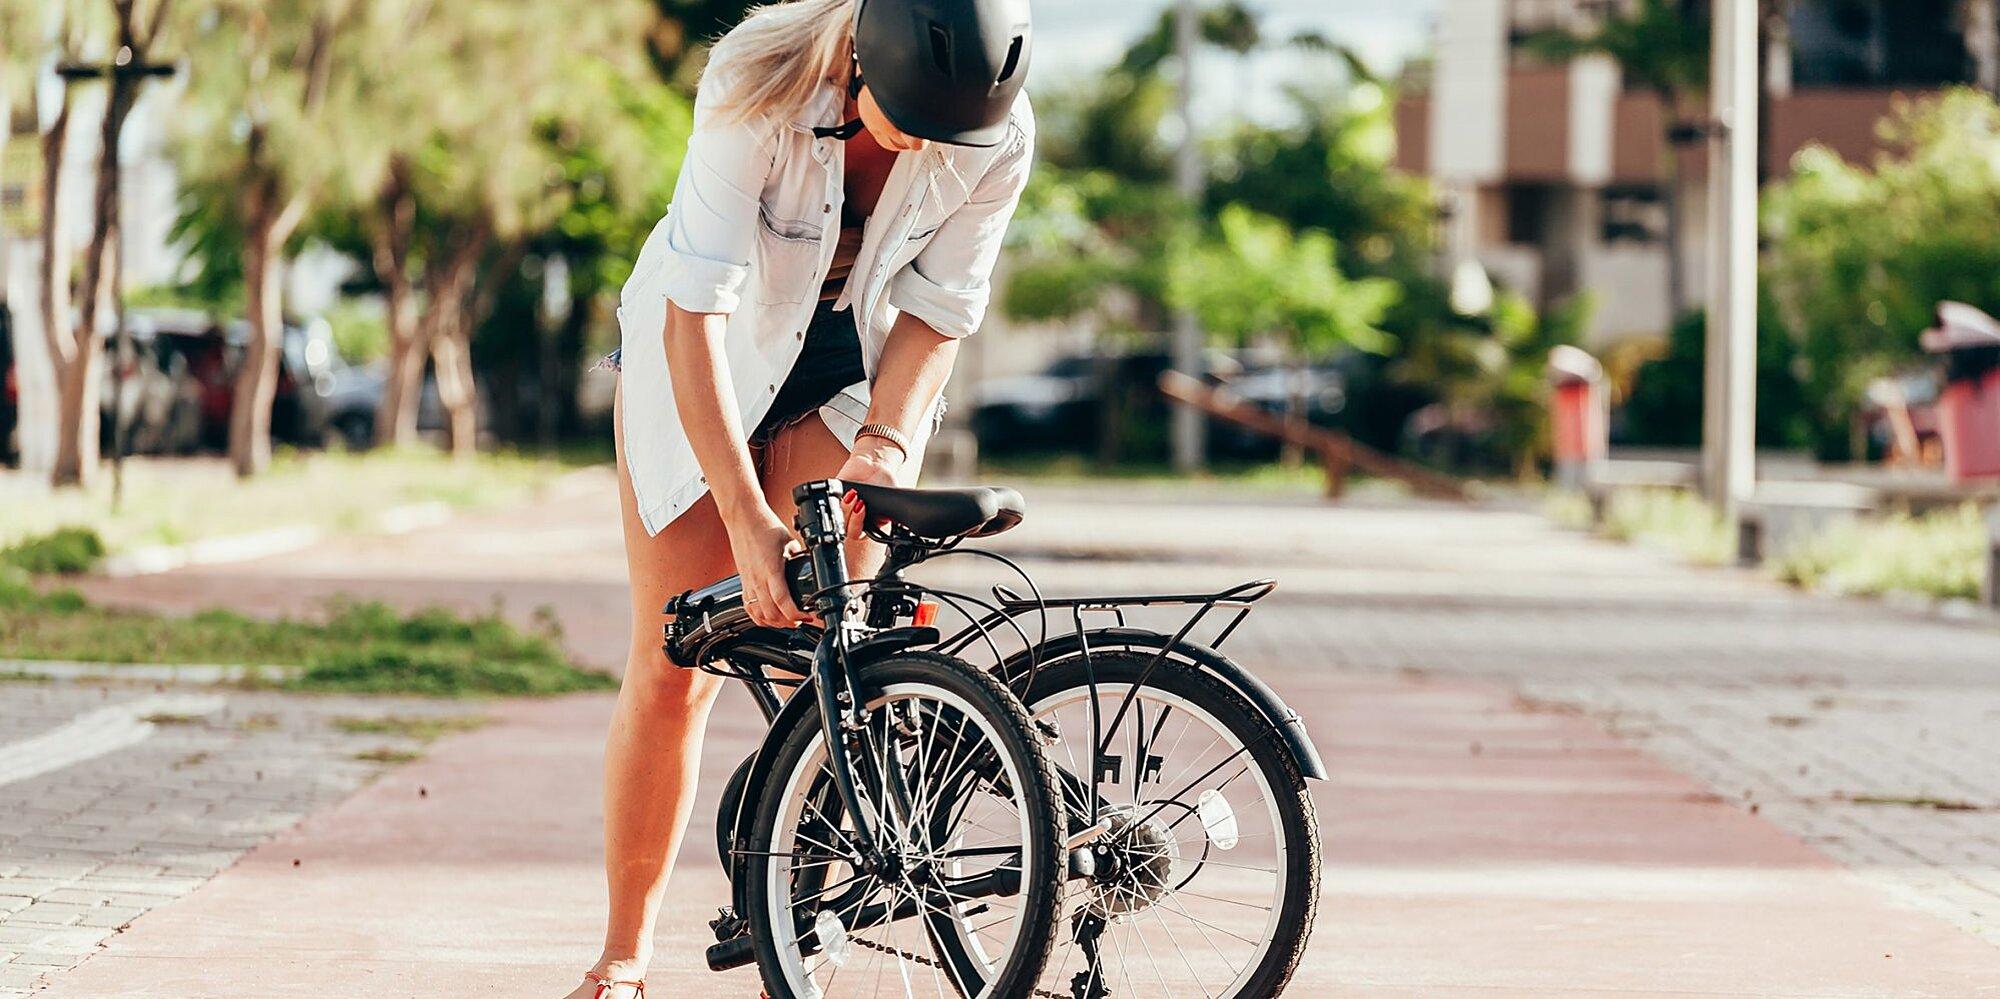 The Best Folding Bike Options for Commuting, Mountain Biking, Trails, and More | Shape - Shape Magazine